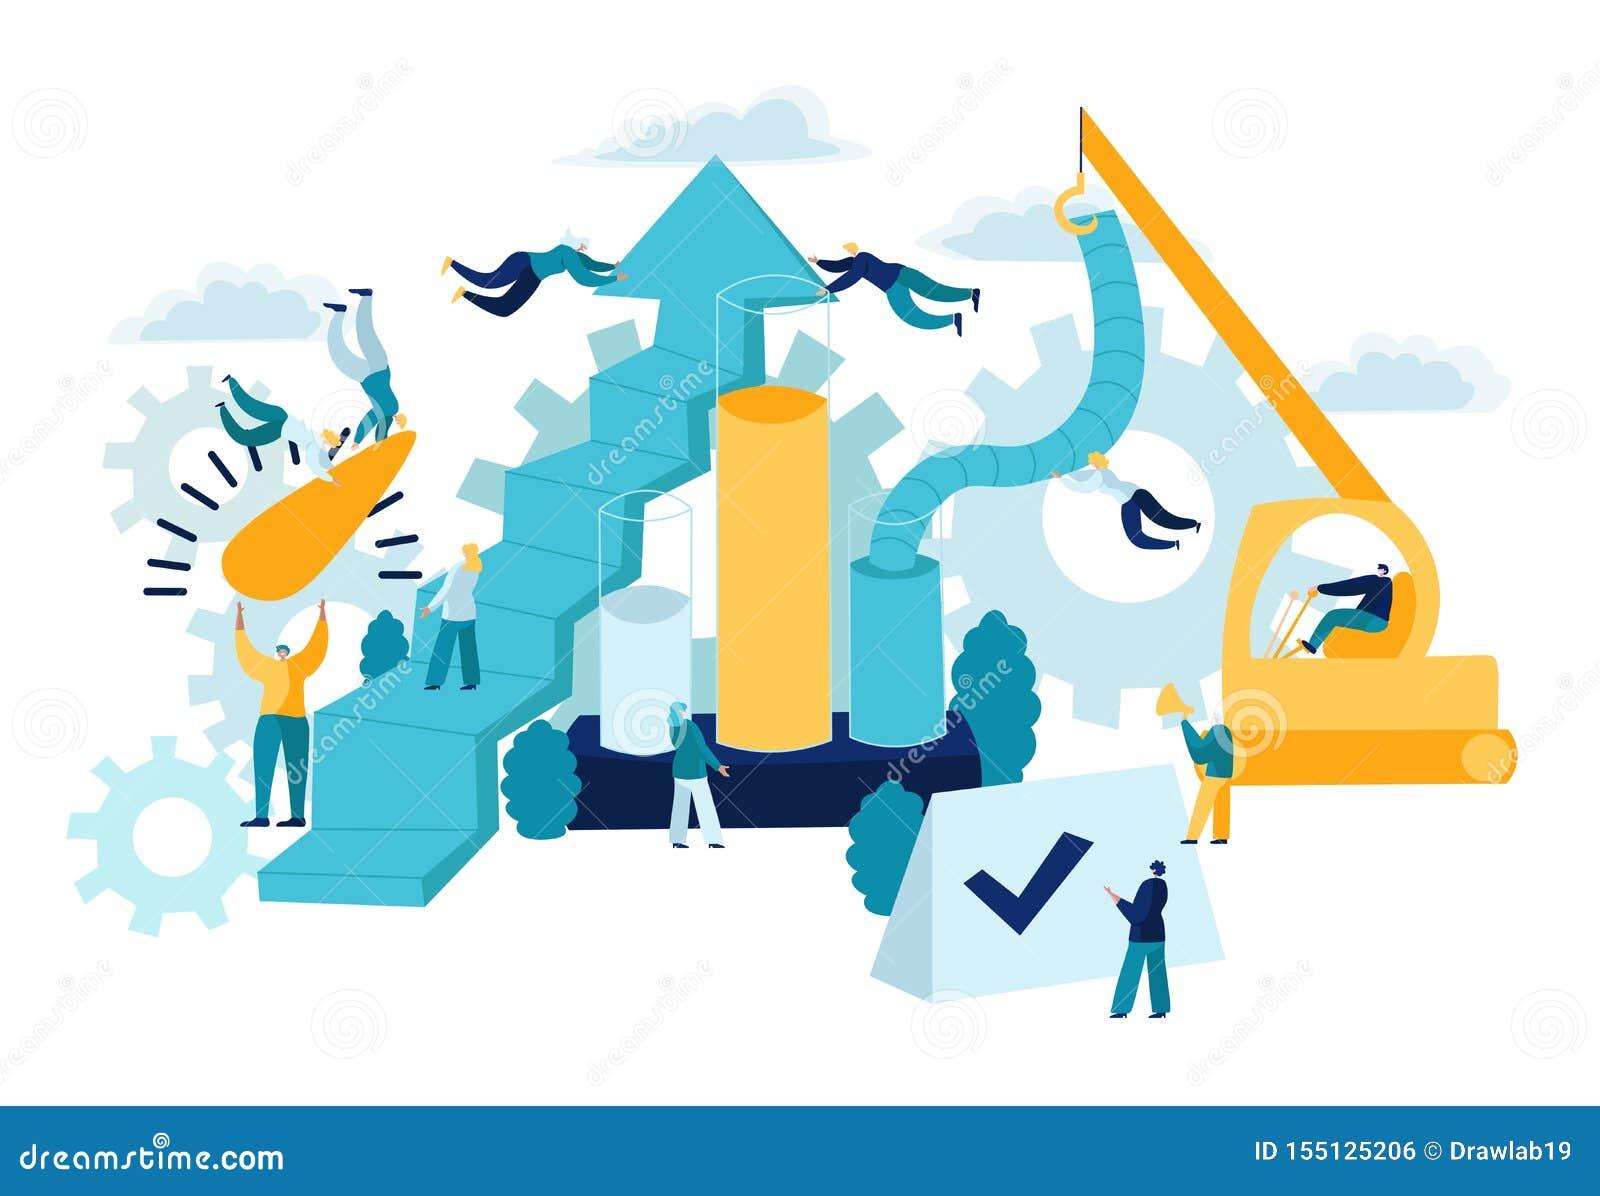 KPI concept, evaluation, optimization, strategy, checklist and measurement. Key Performance Indicatorsusing Business